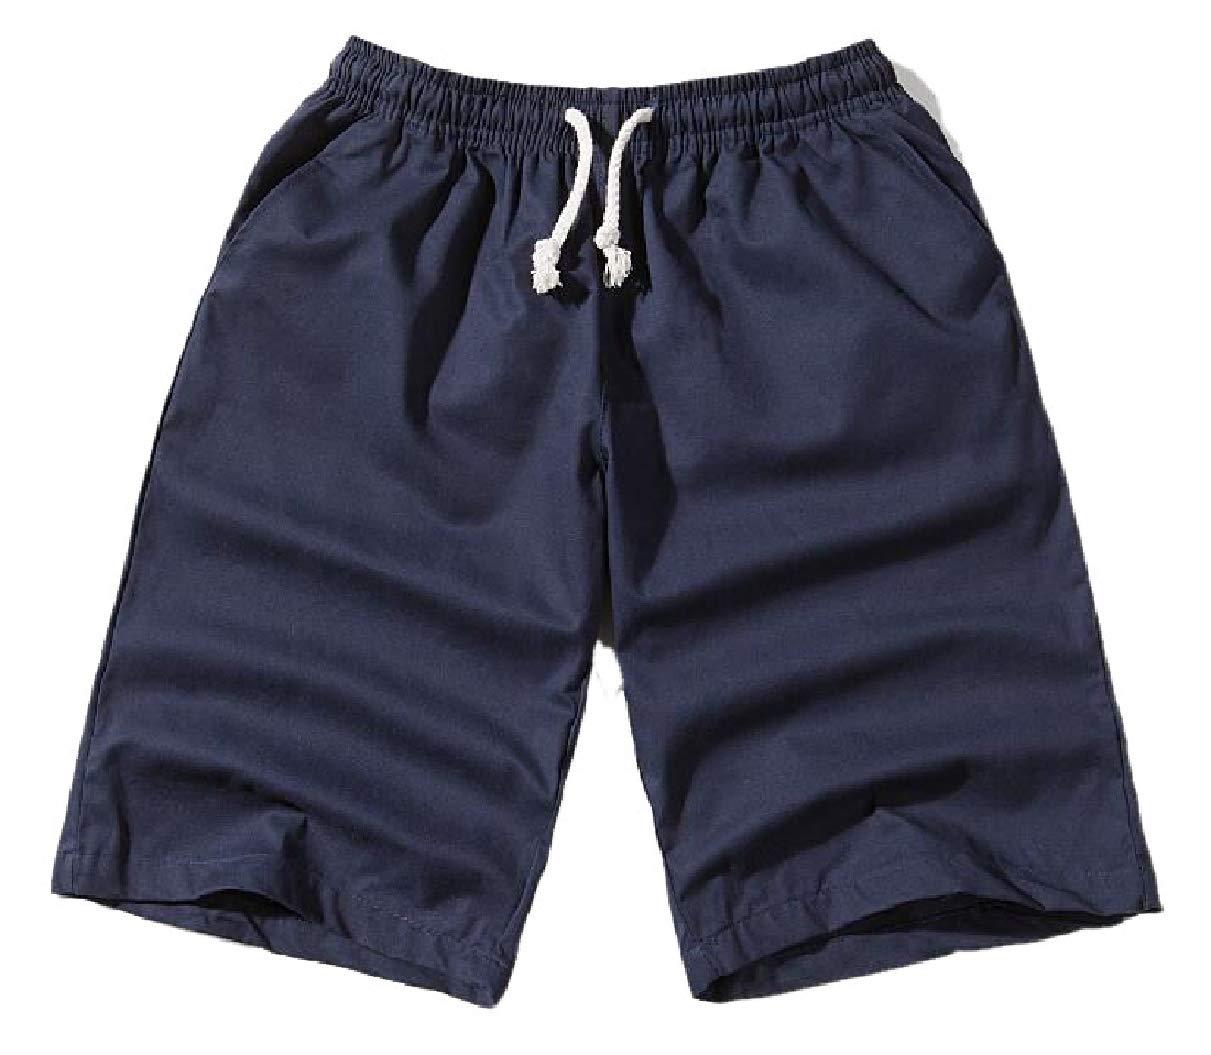 YIhujiuben Mens Loose Casual Lightweight Elastic Waist Cotton Beach Shorts Navy Blue XXXL